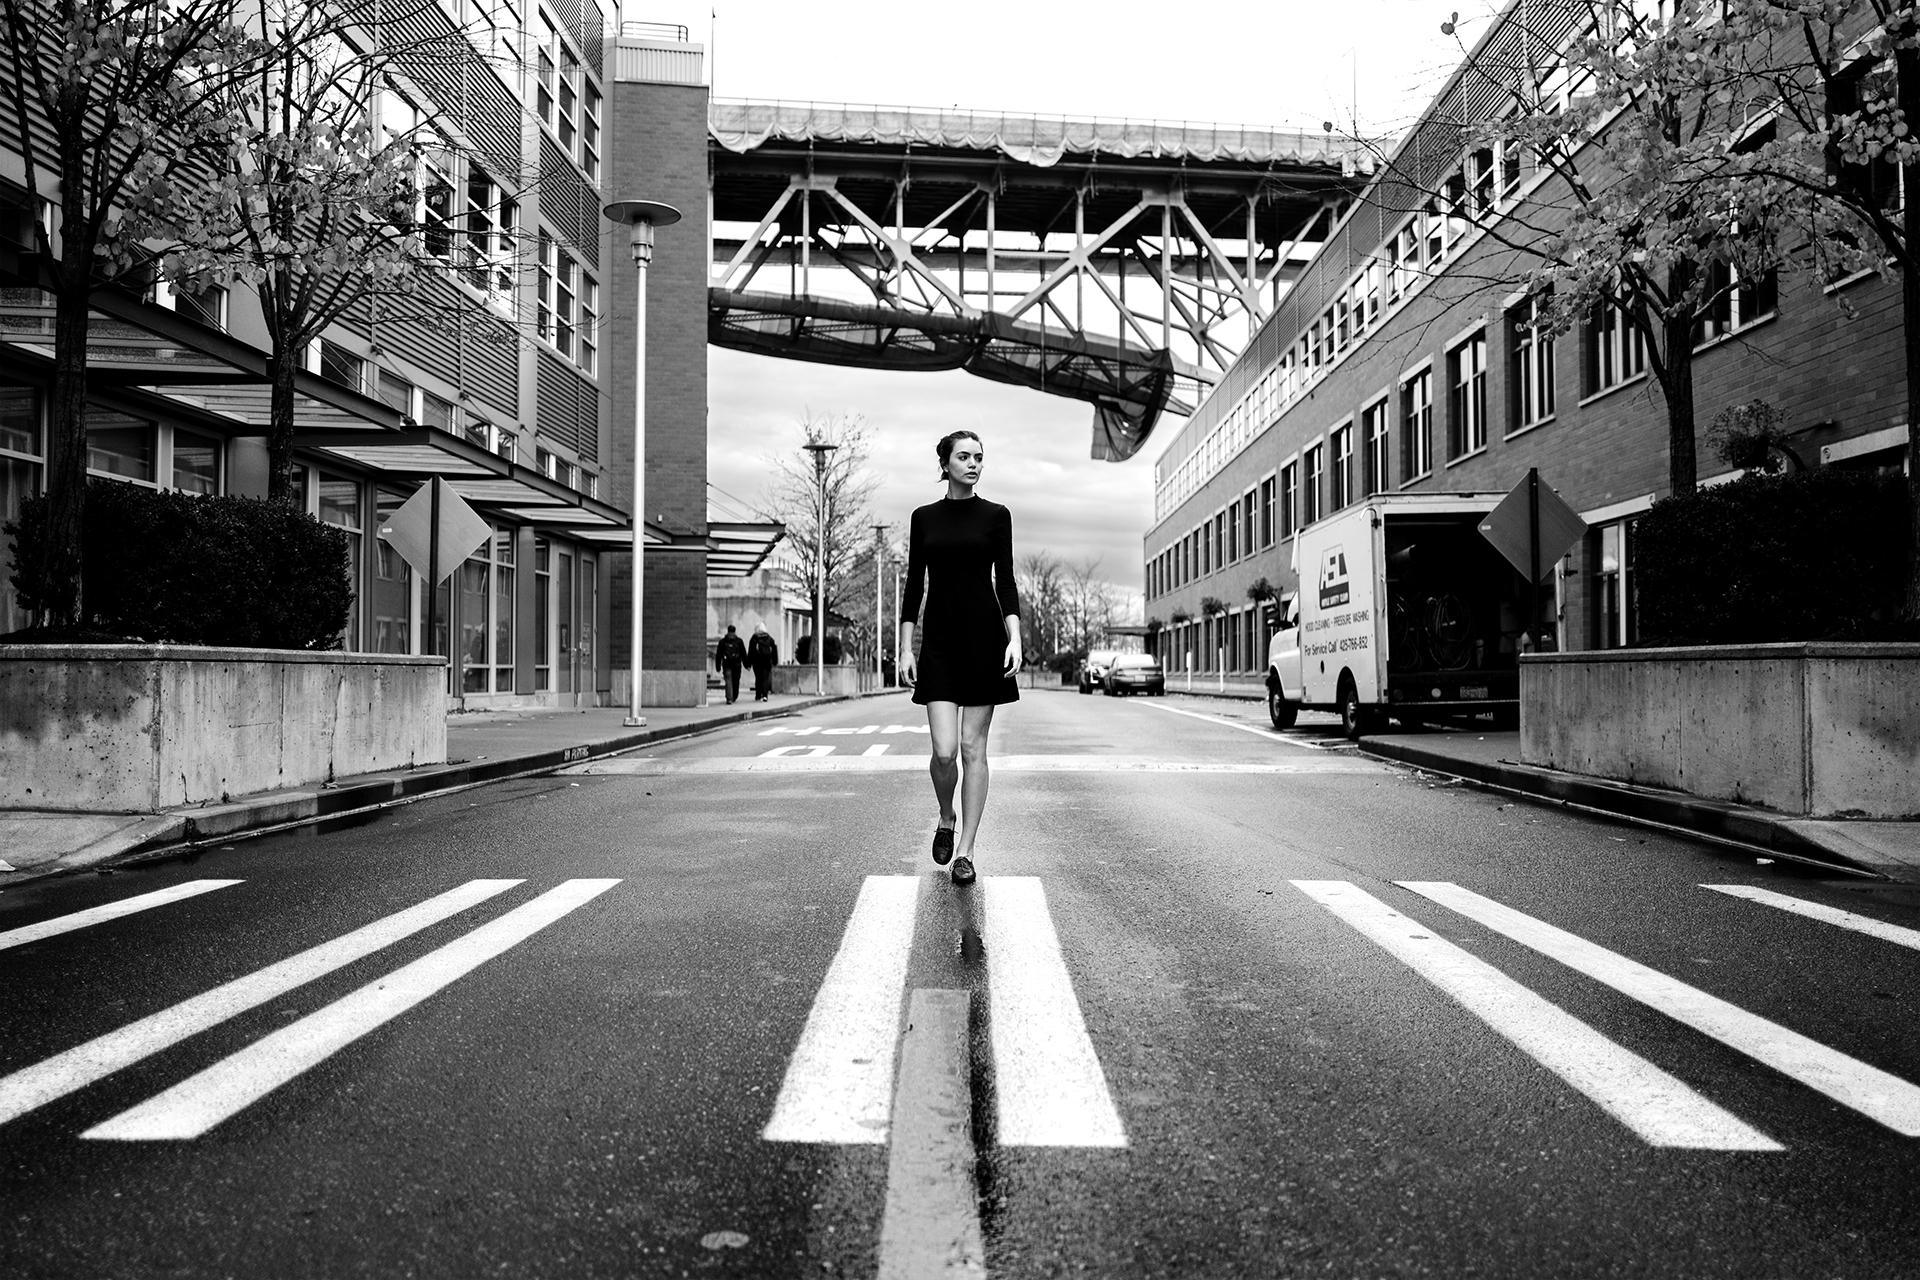 Wallpaper : model, street, road, cinematic, Seattle, Leica, Google,  infrastructure, blackandwhite, wideangle, dramatic, bw, crosswalk, leicaq, q,  28mm, ...